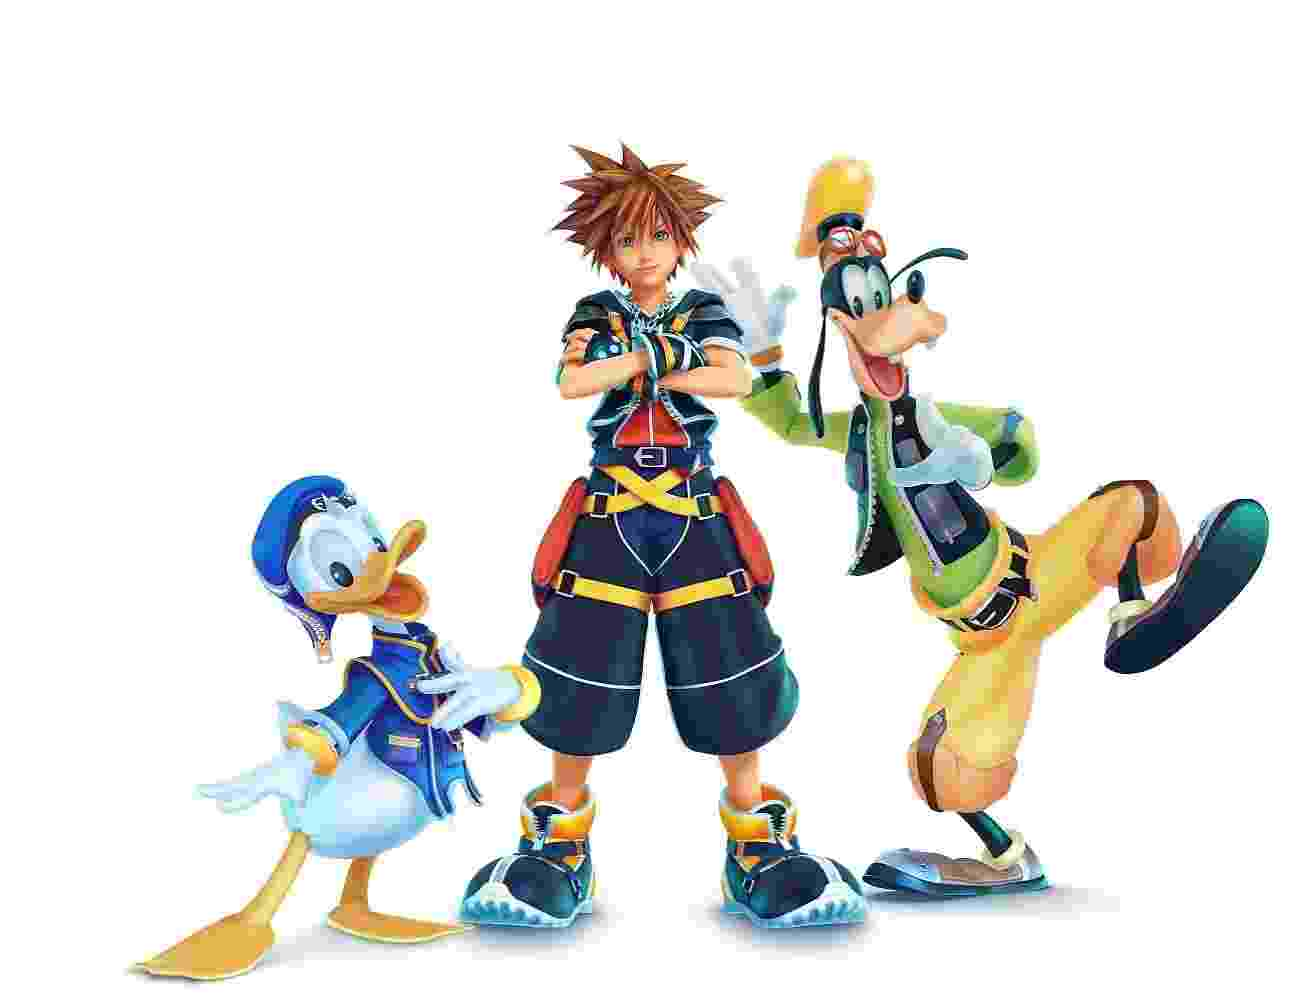 Kingdom Hearts III - Divulgação